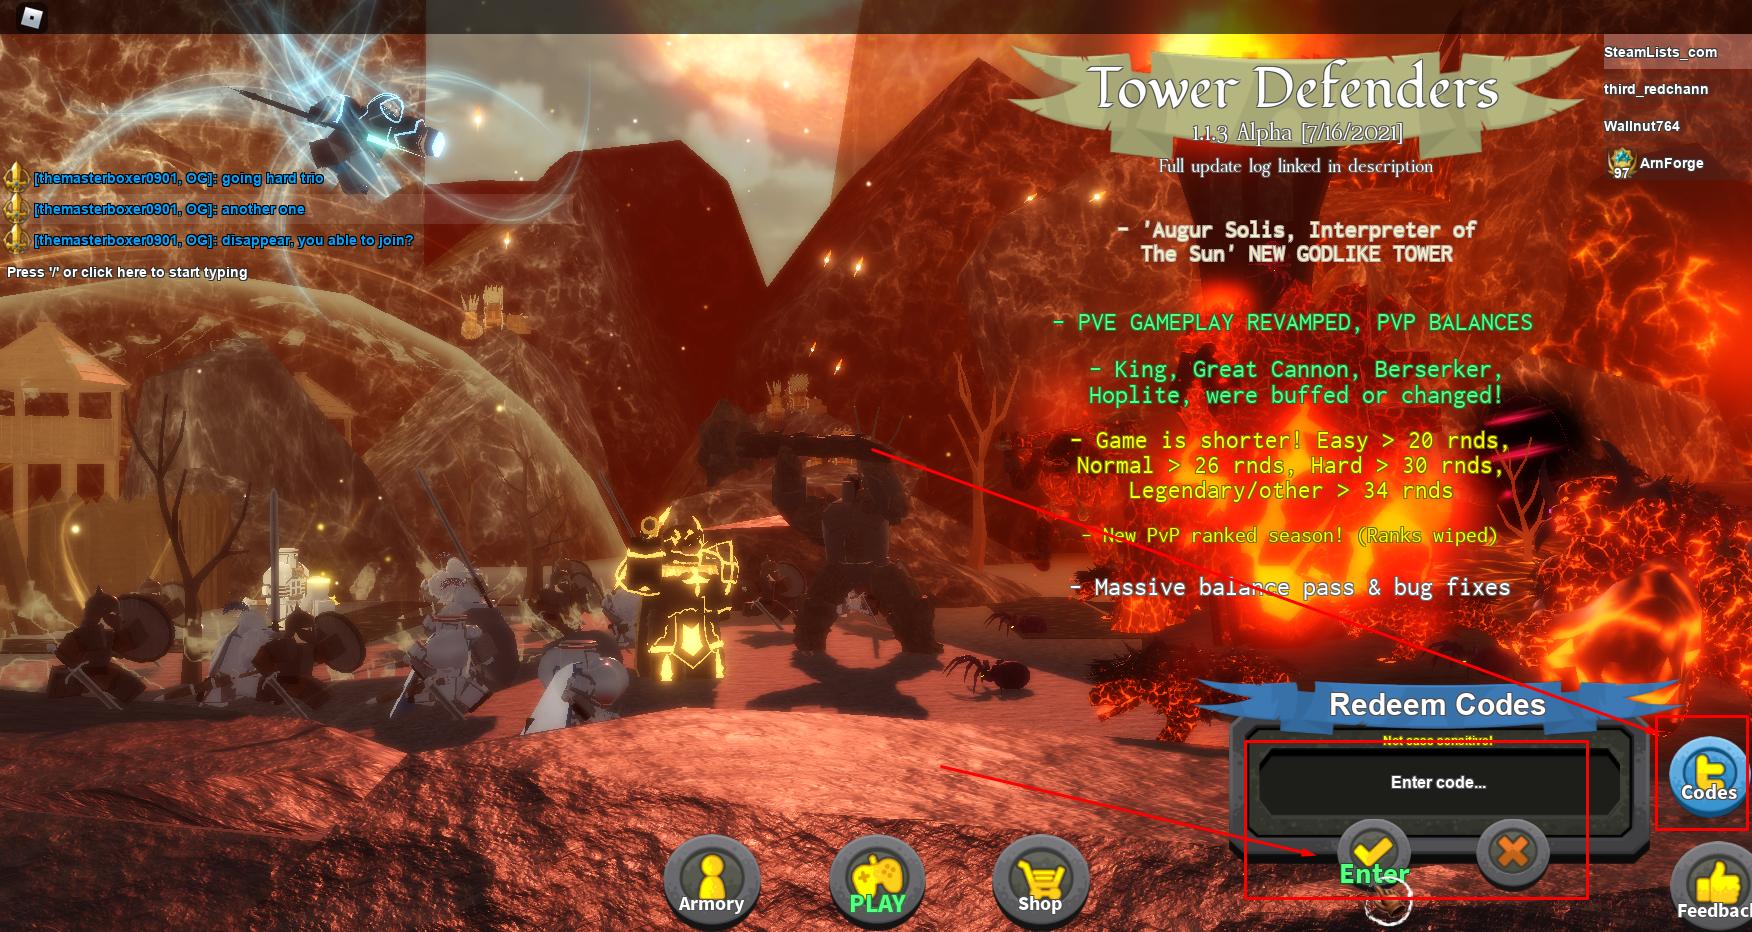 Roblox Tower Defenders Codes